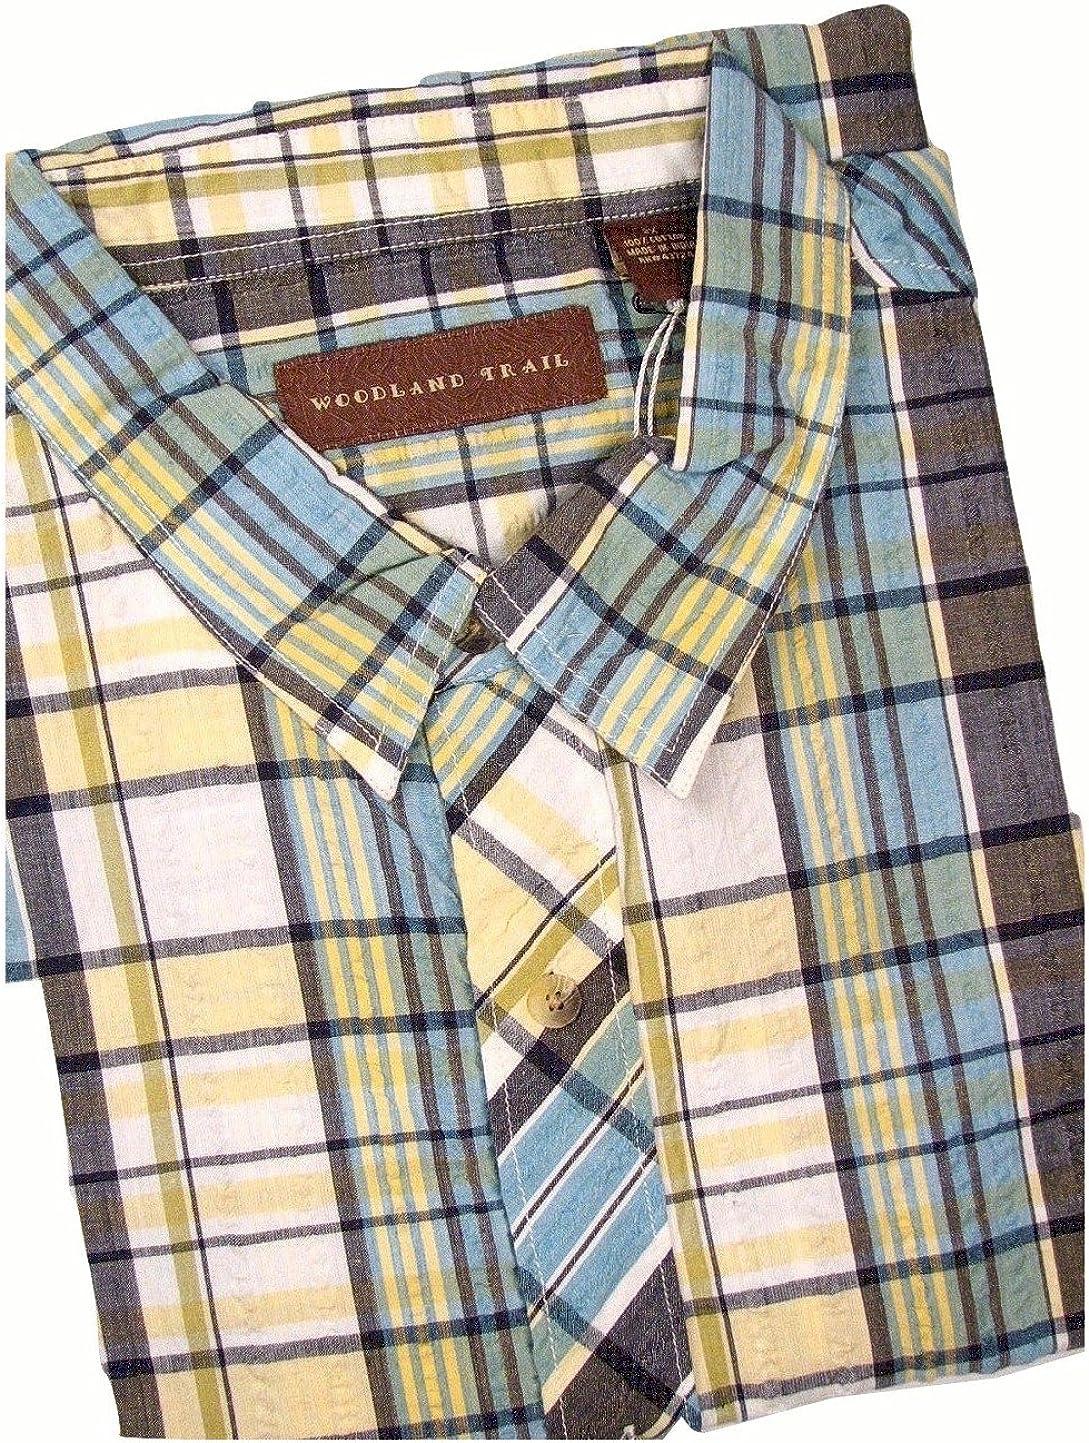 Woodland Trail Seersucker Short Sleeve Shirt